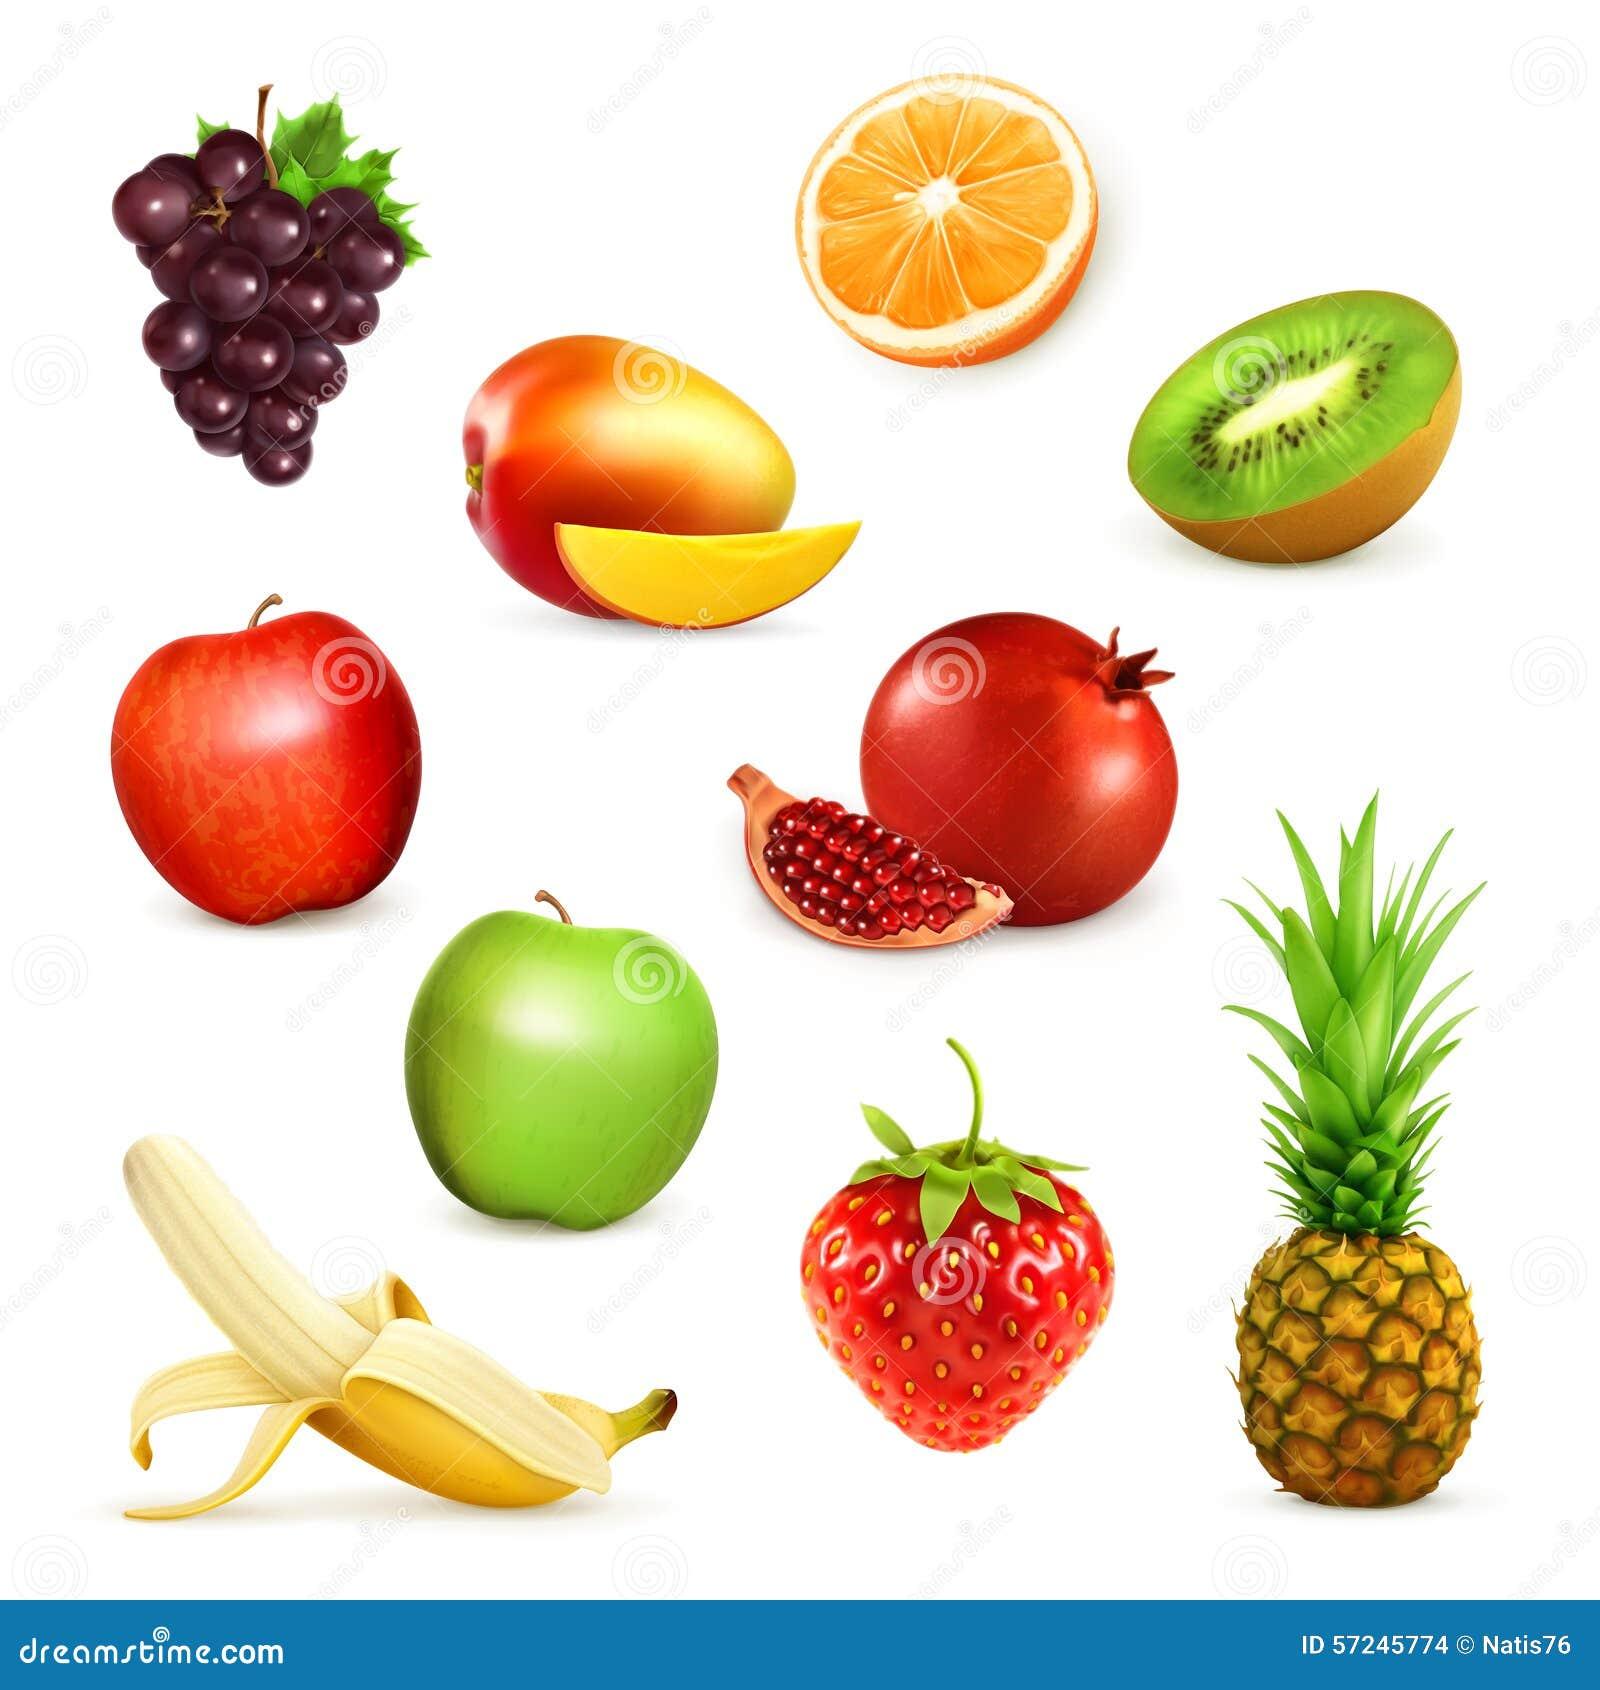 Fruits vector illustrations